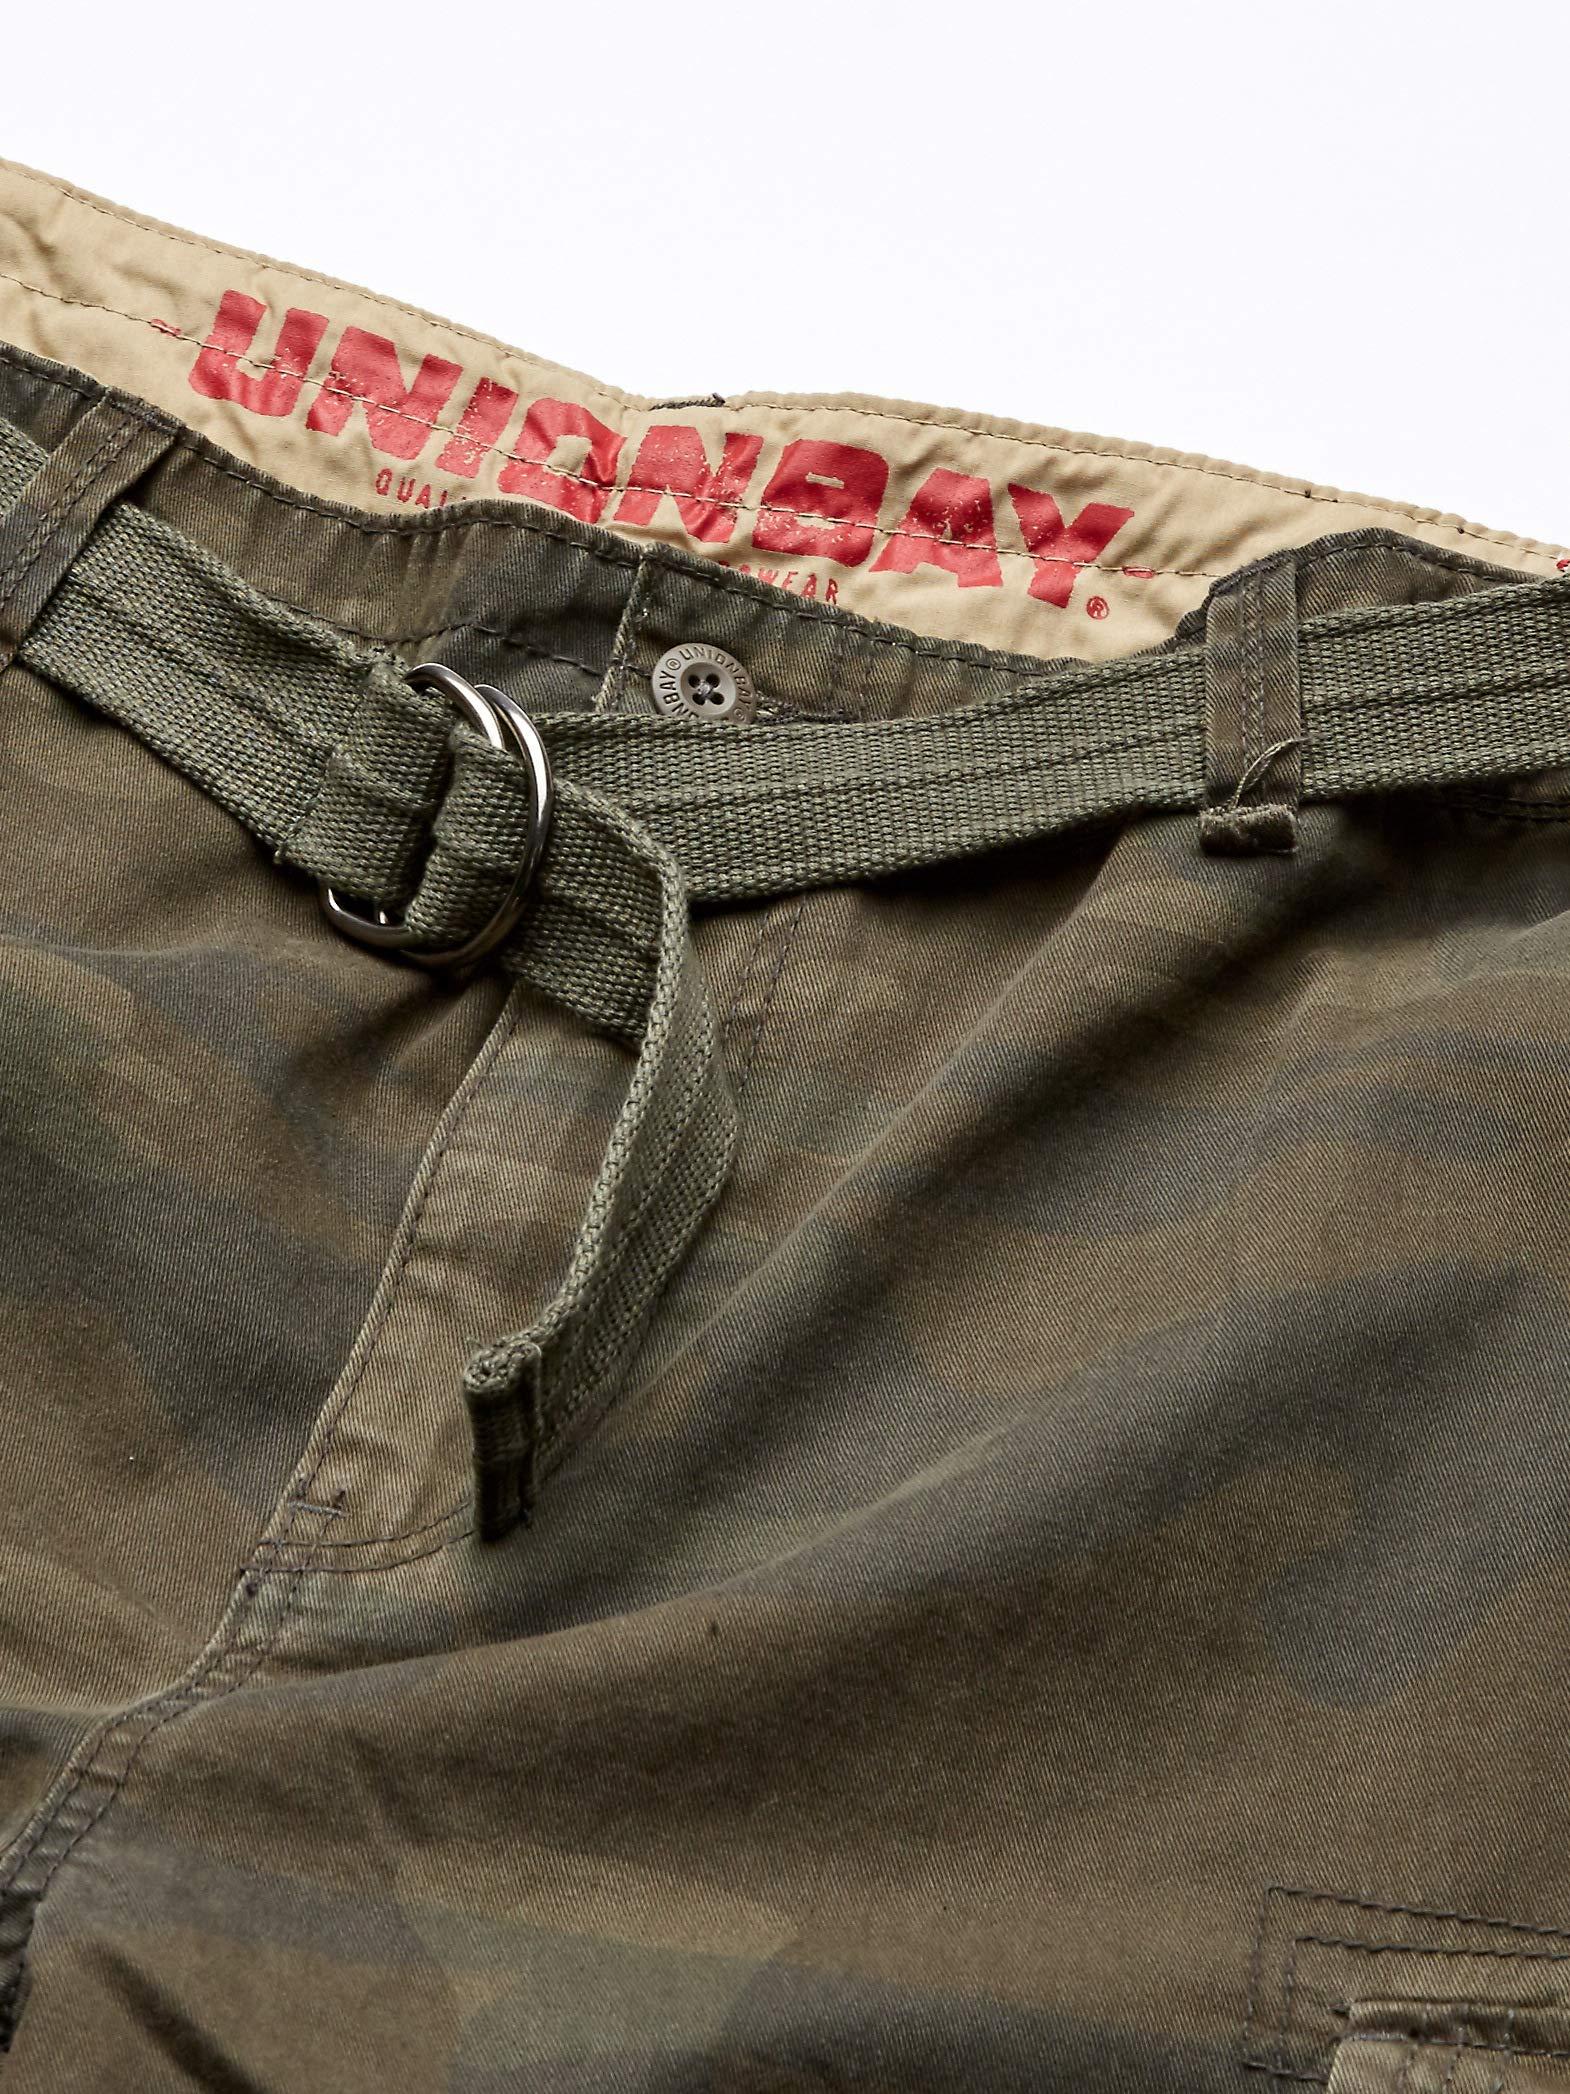 UNIONBAY Men's Survivor Belted Cargo Short-Reg and Big & Tall Sizes